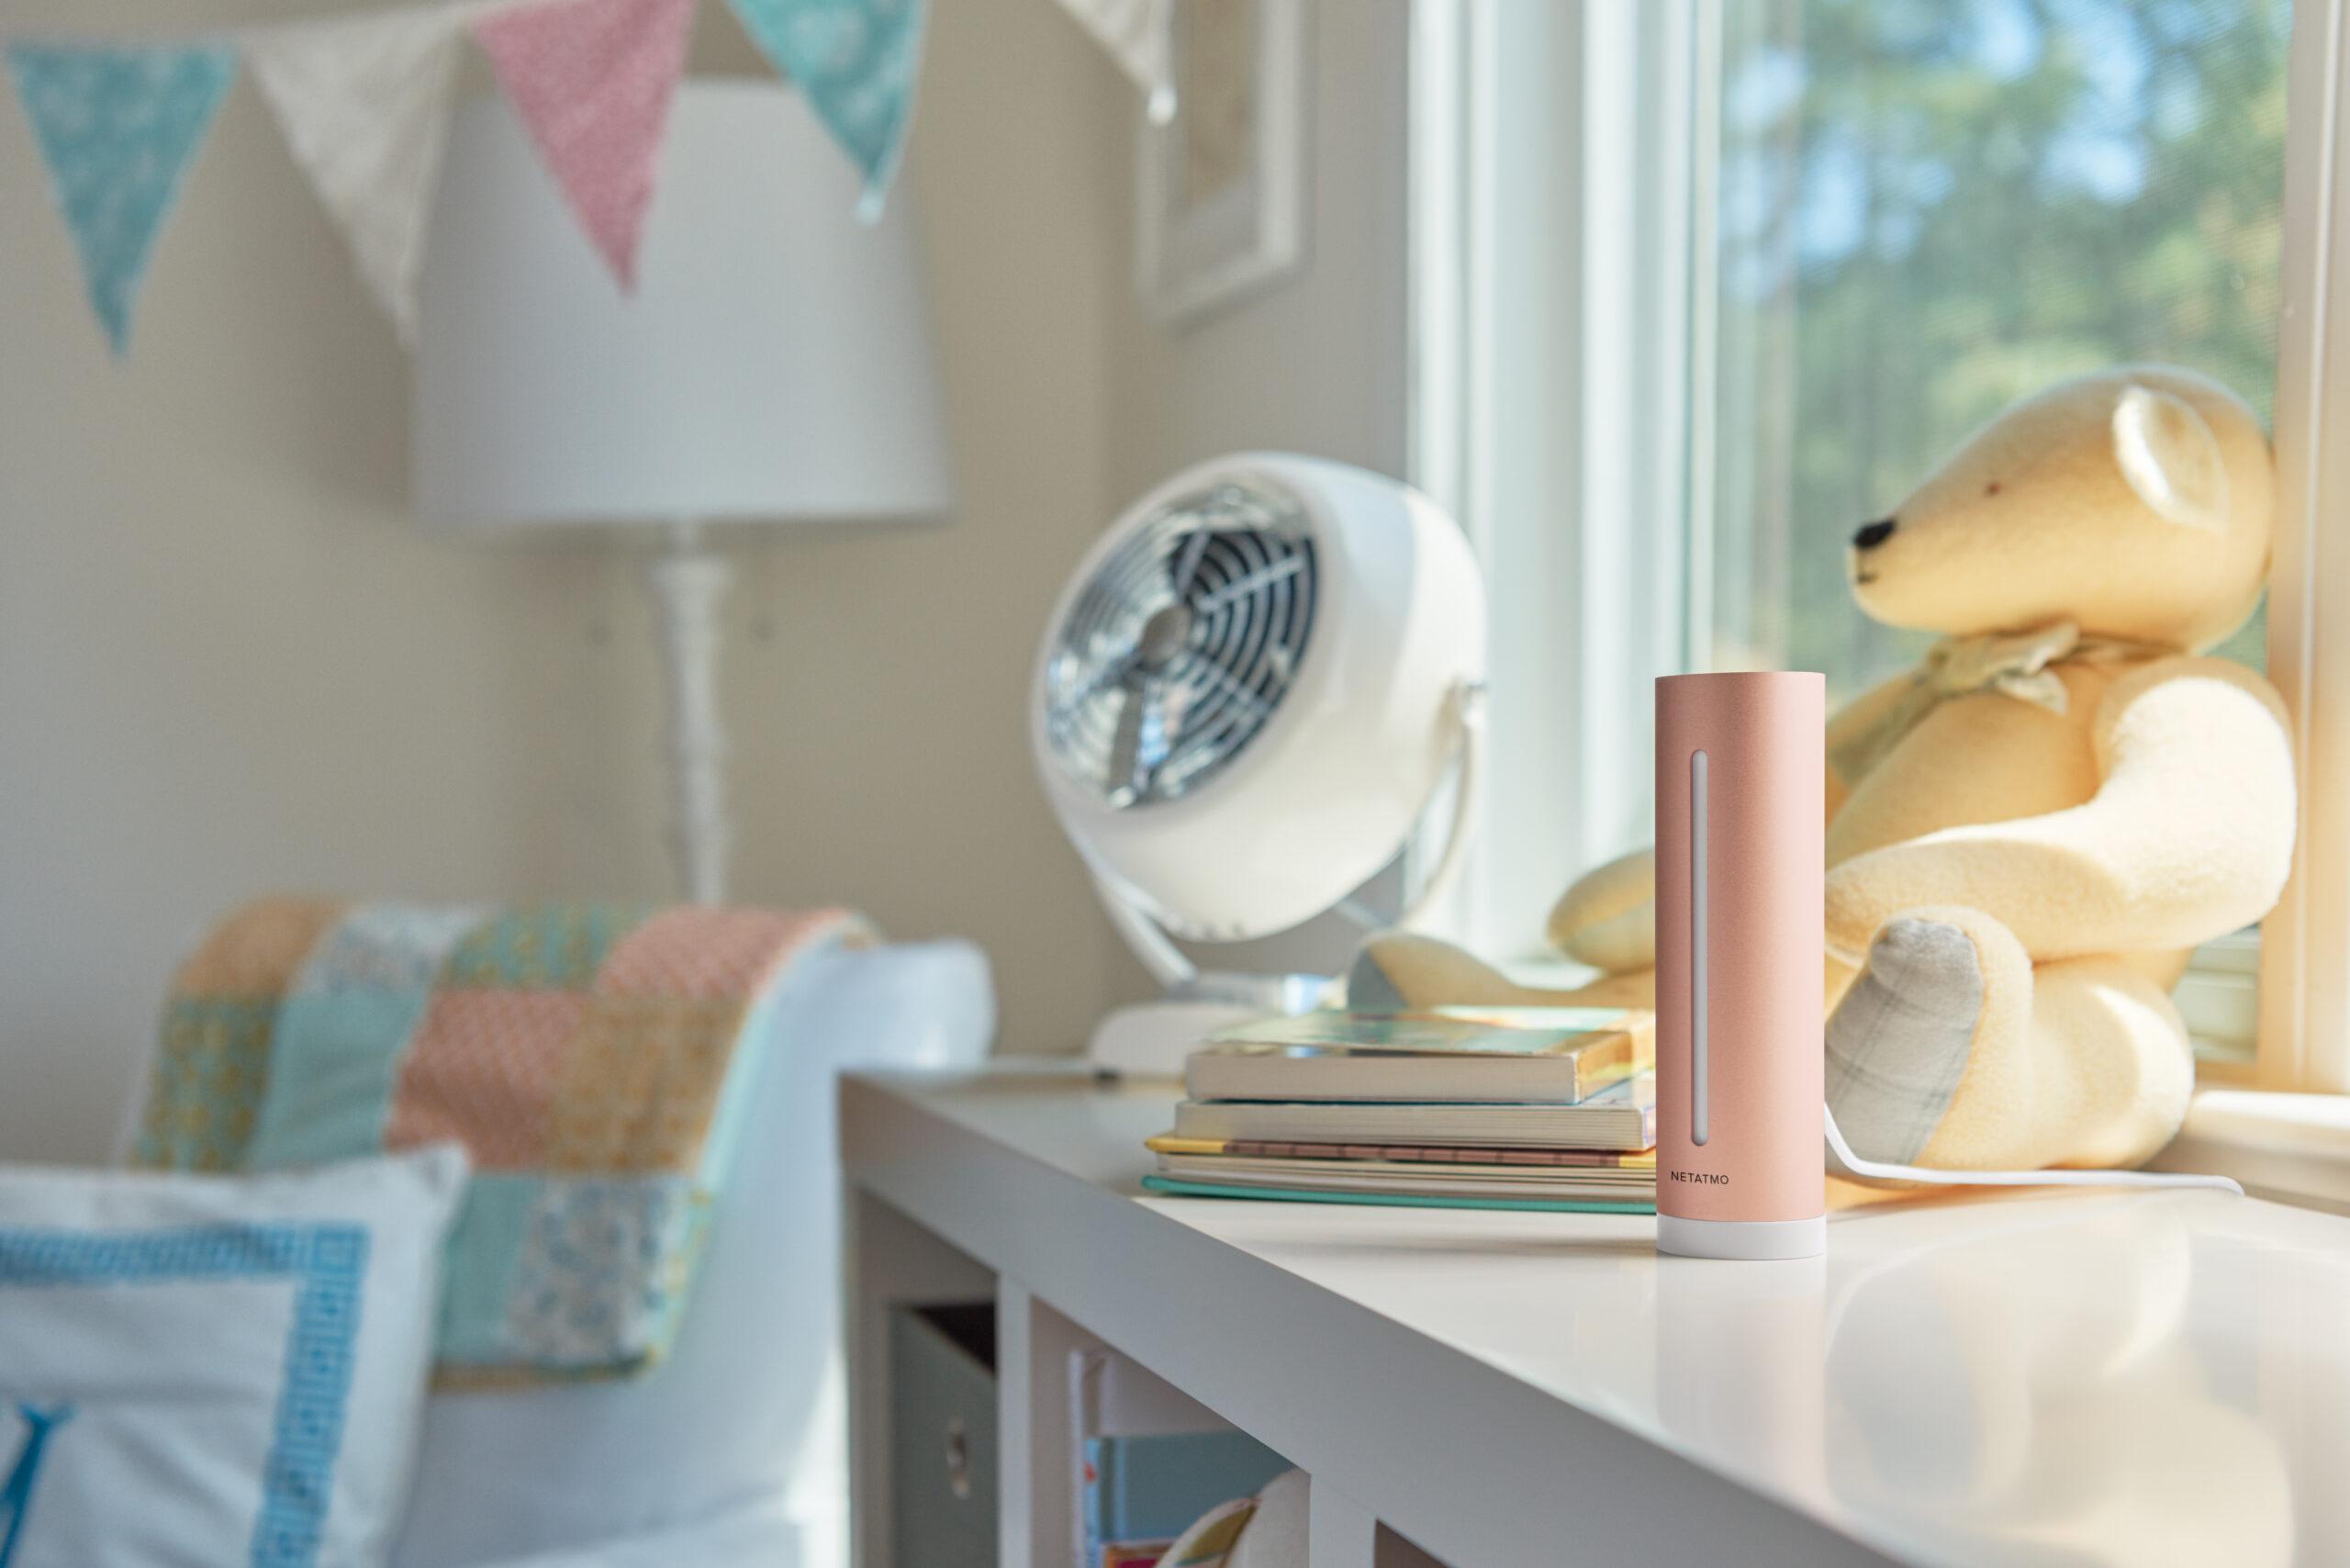 Smart sensor AirTeq babykamer